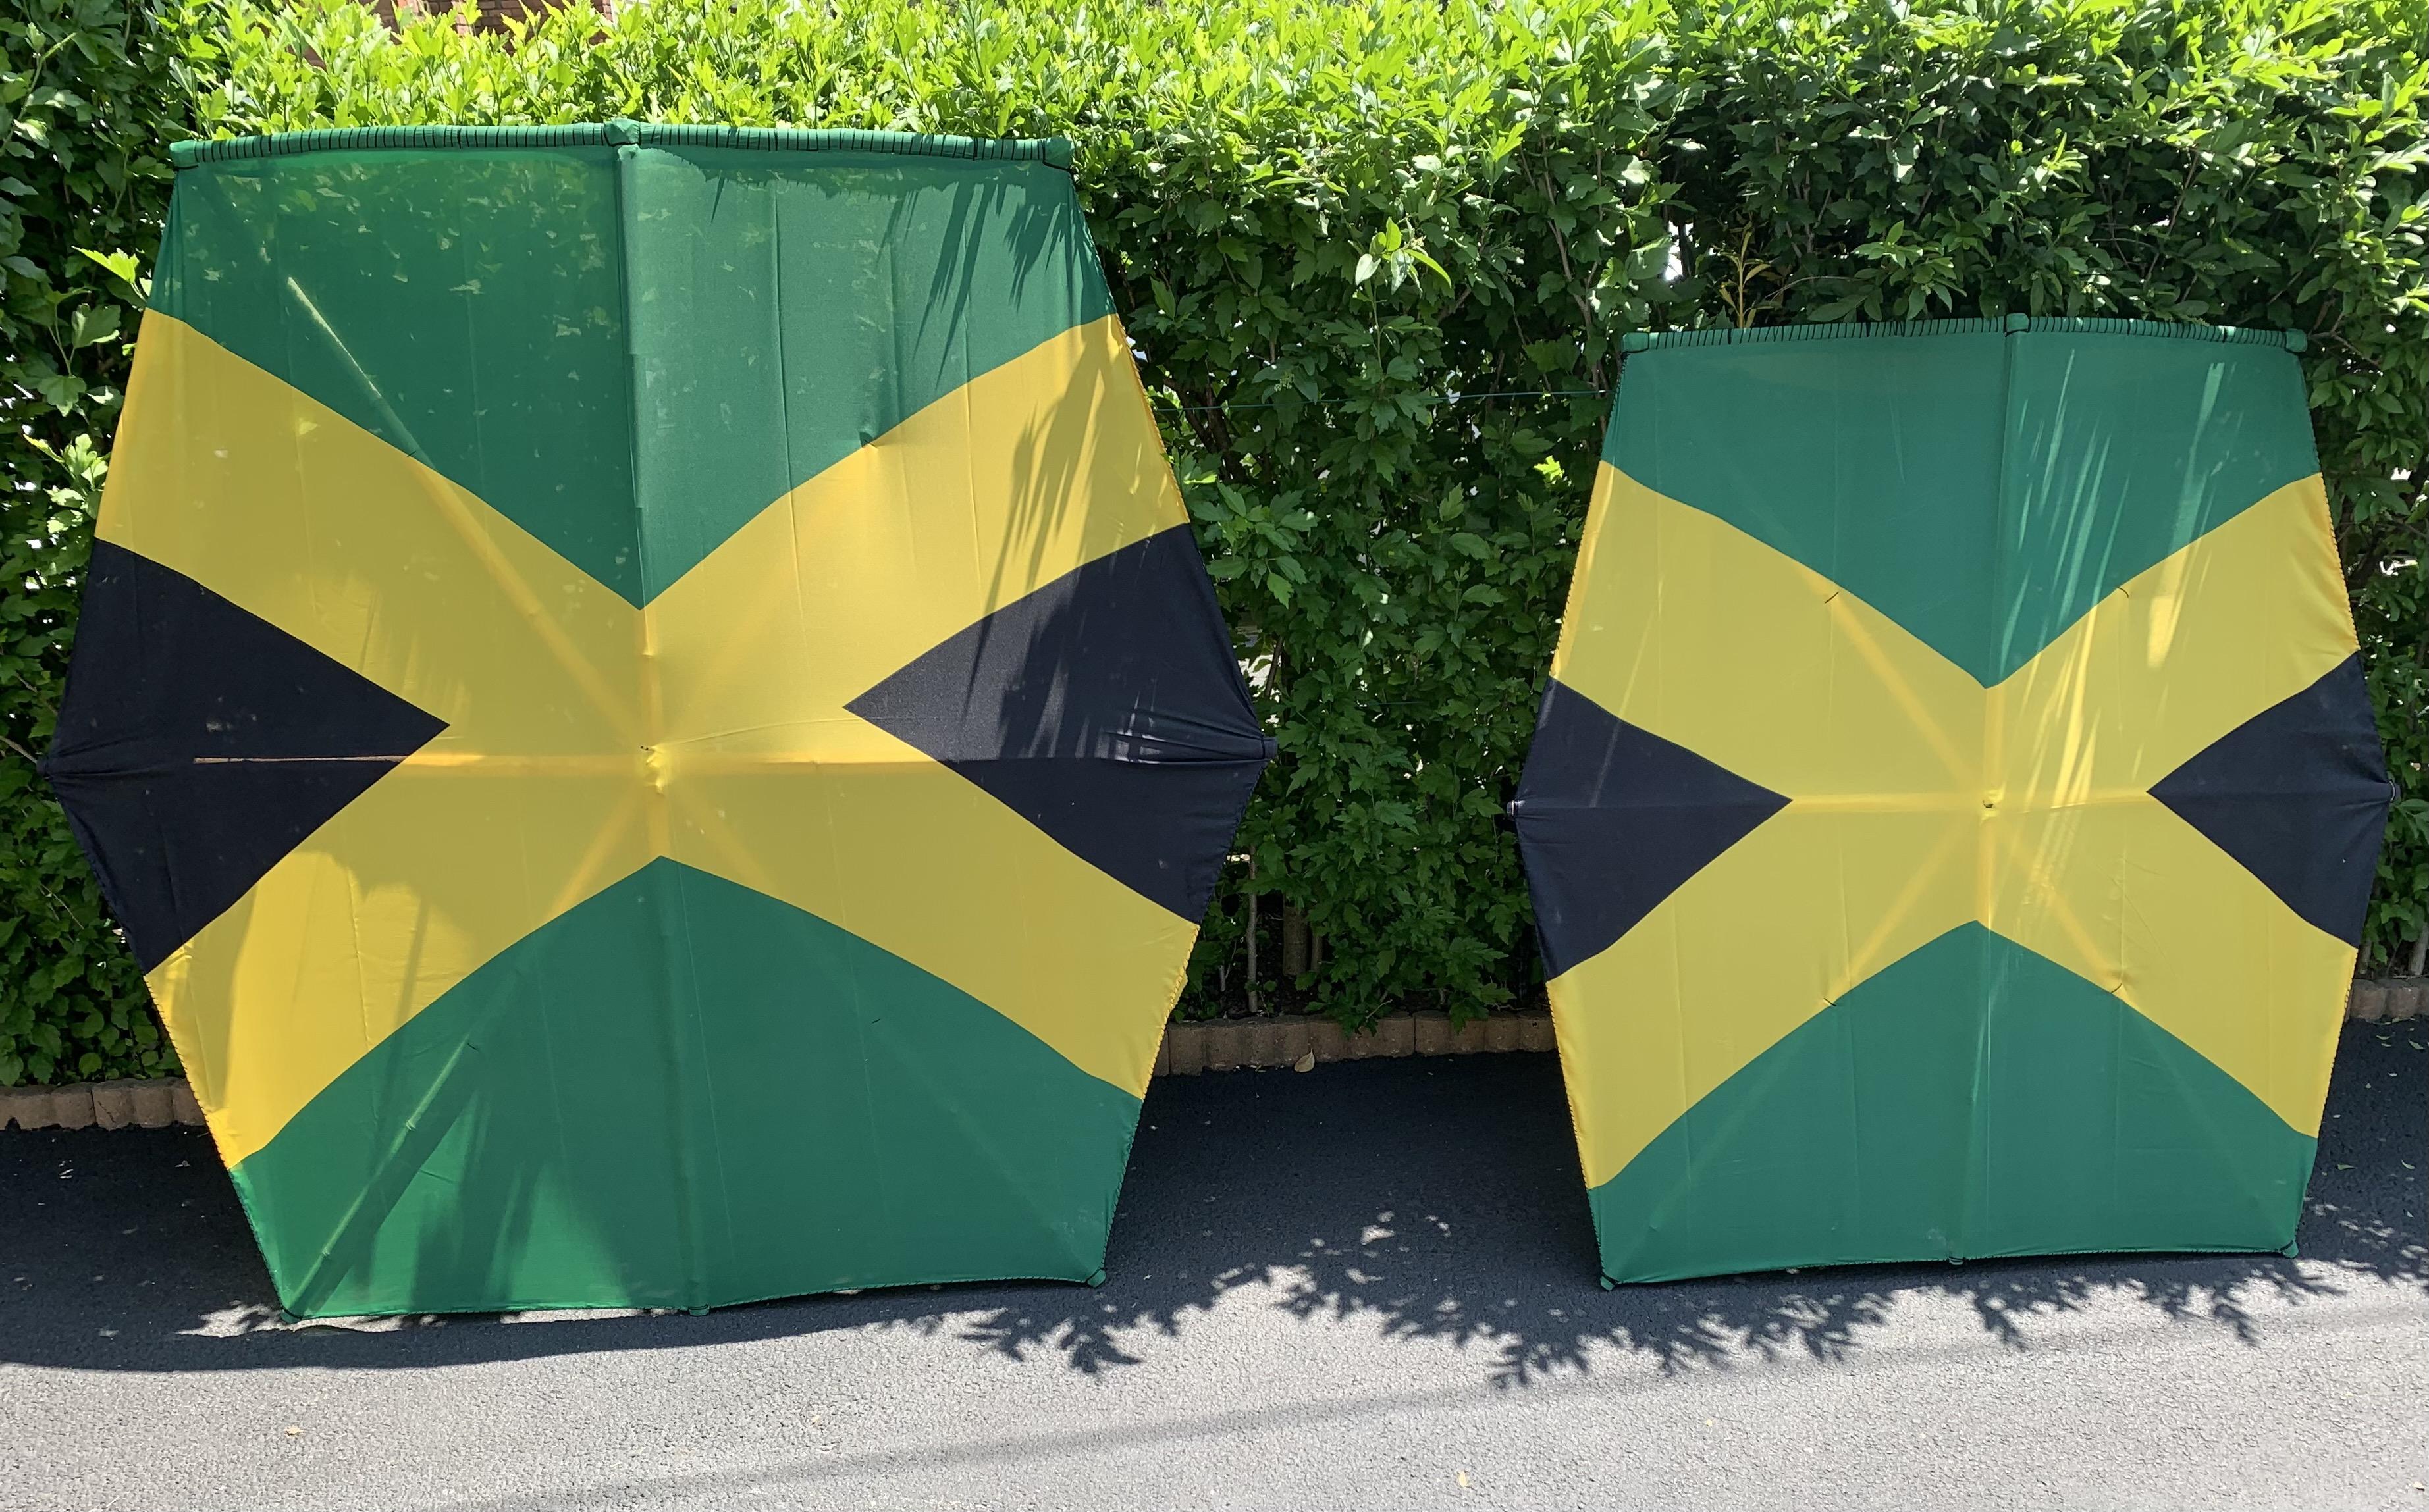 4 feet and 5 feet jamaican flag kite